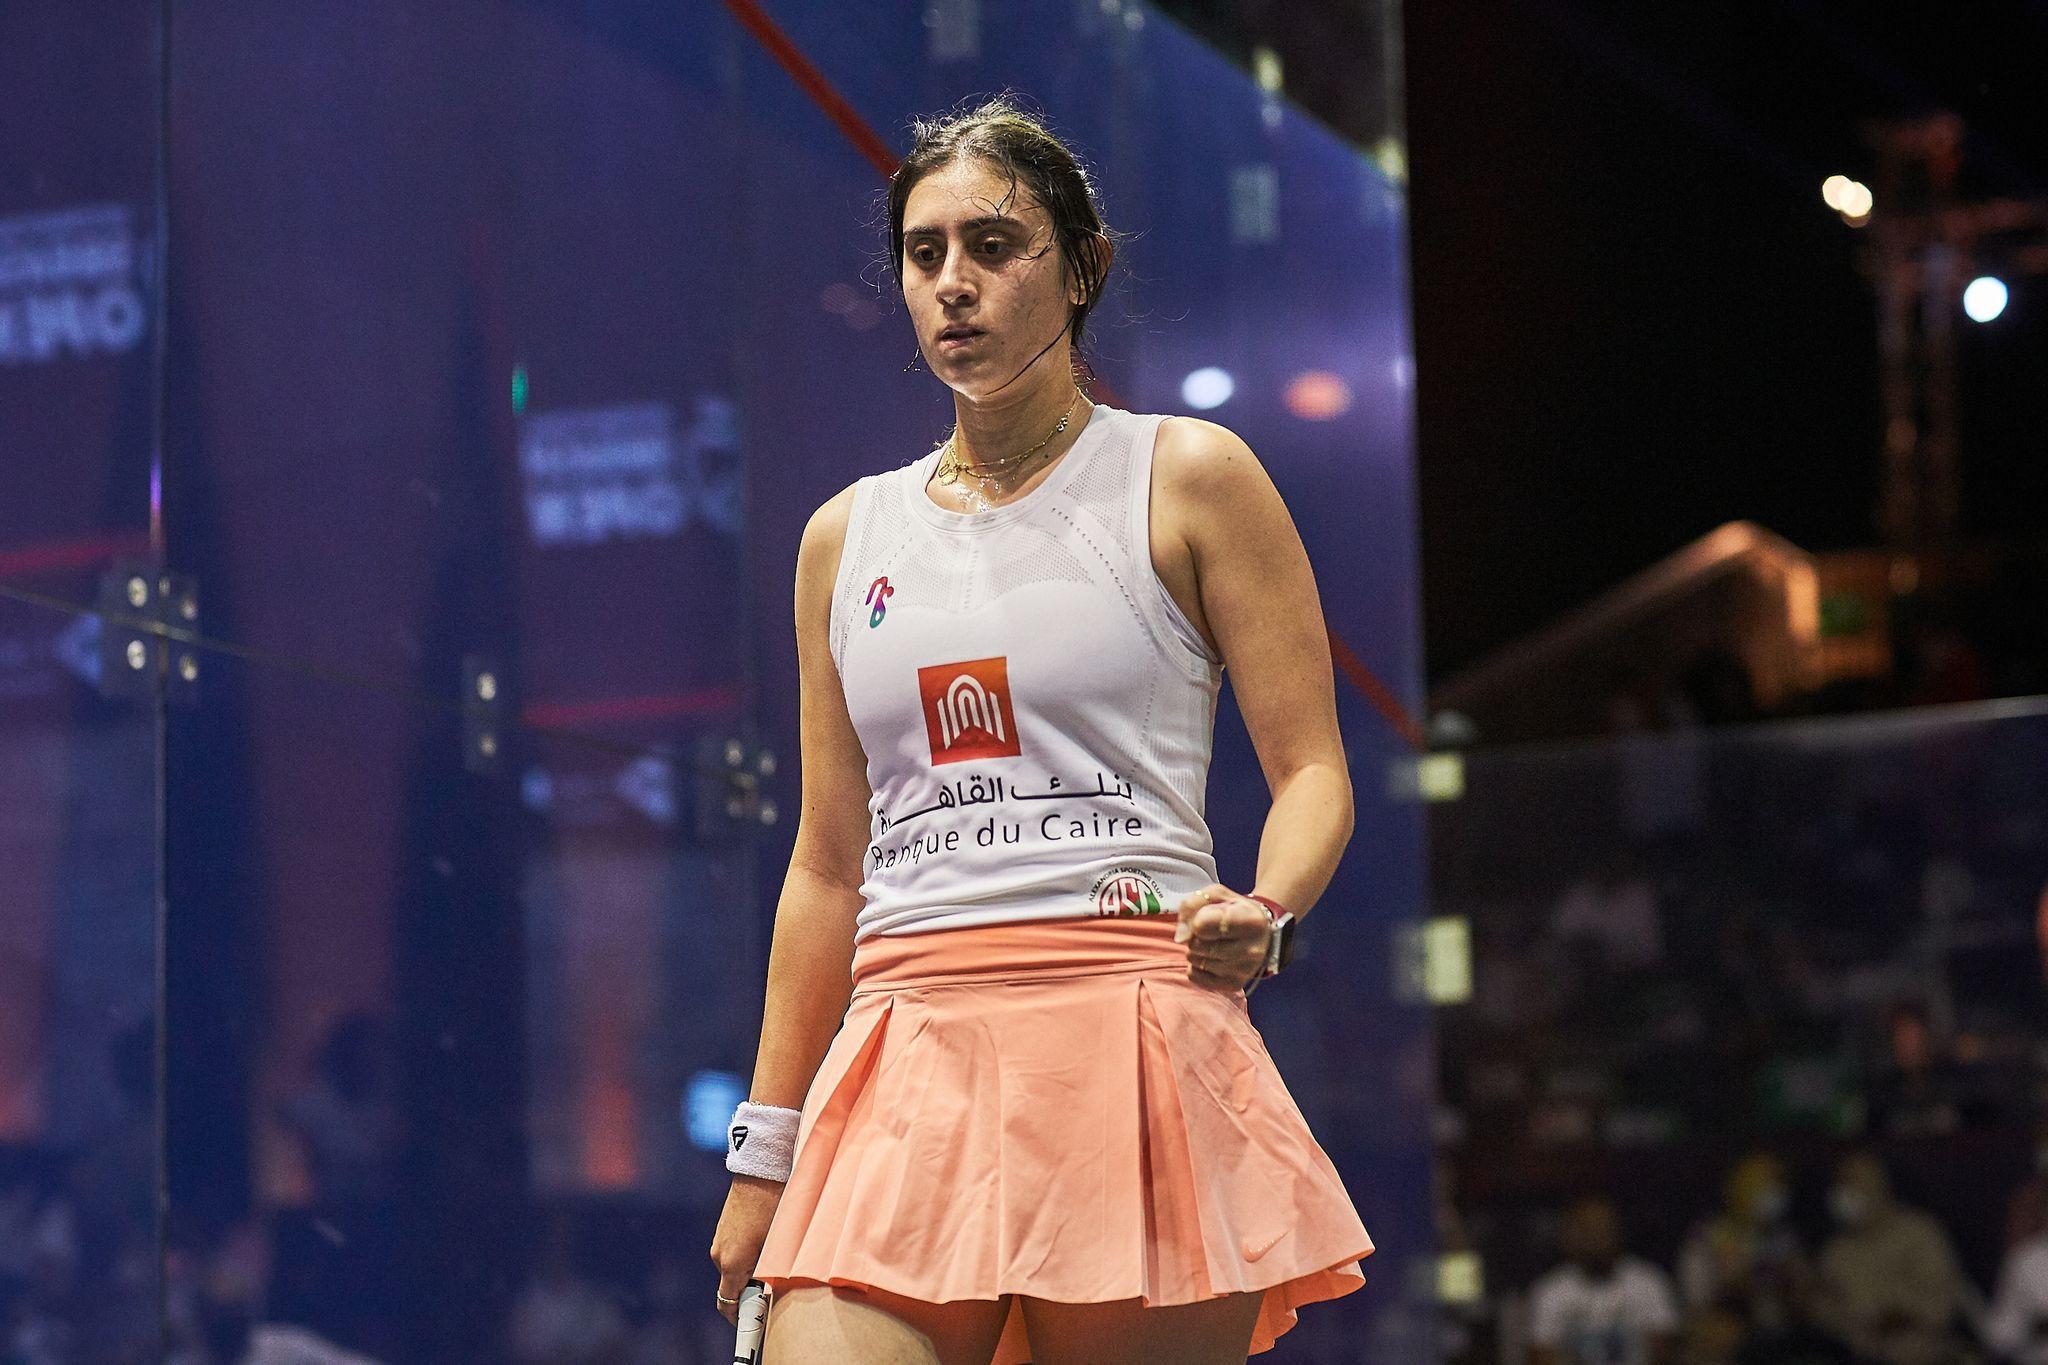 Women's top seed El Sherbini battles to five game win to reach El Gouna International Open final